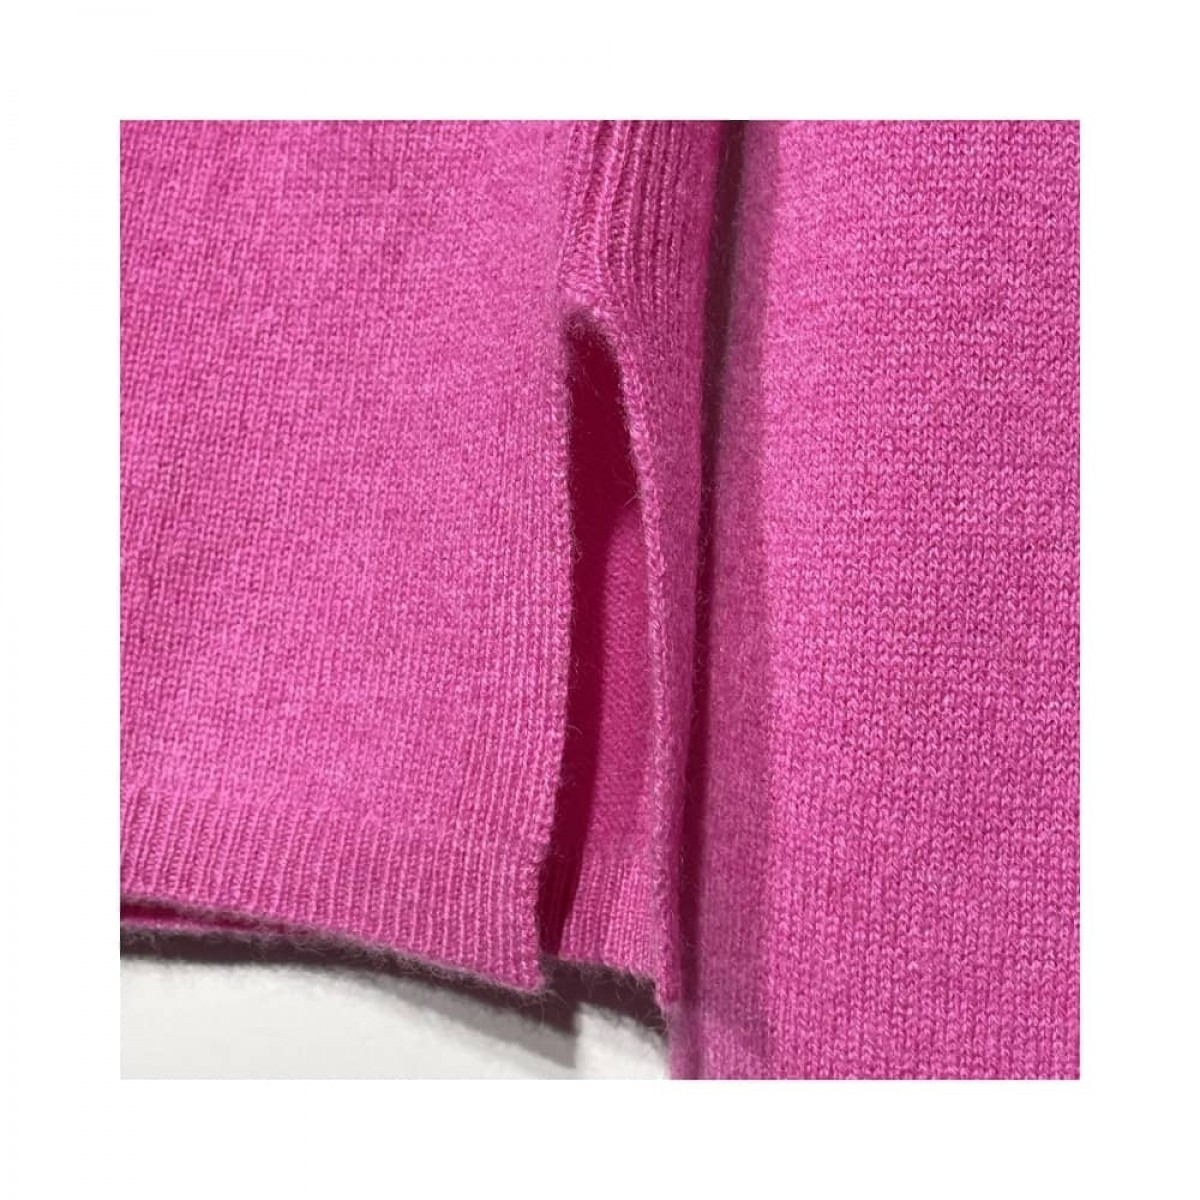 becka strik - rose neon - slids i bund